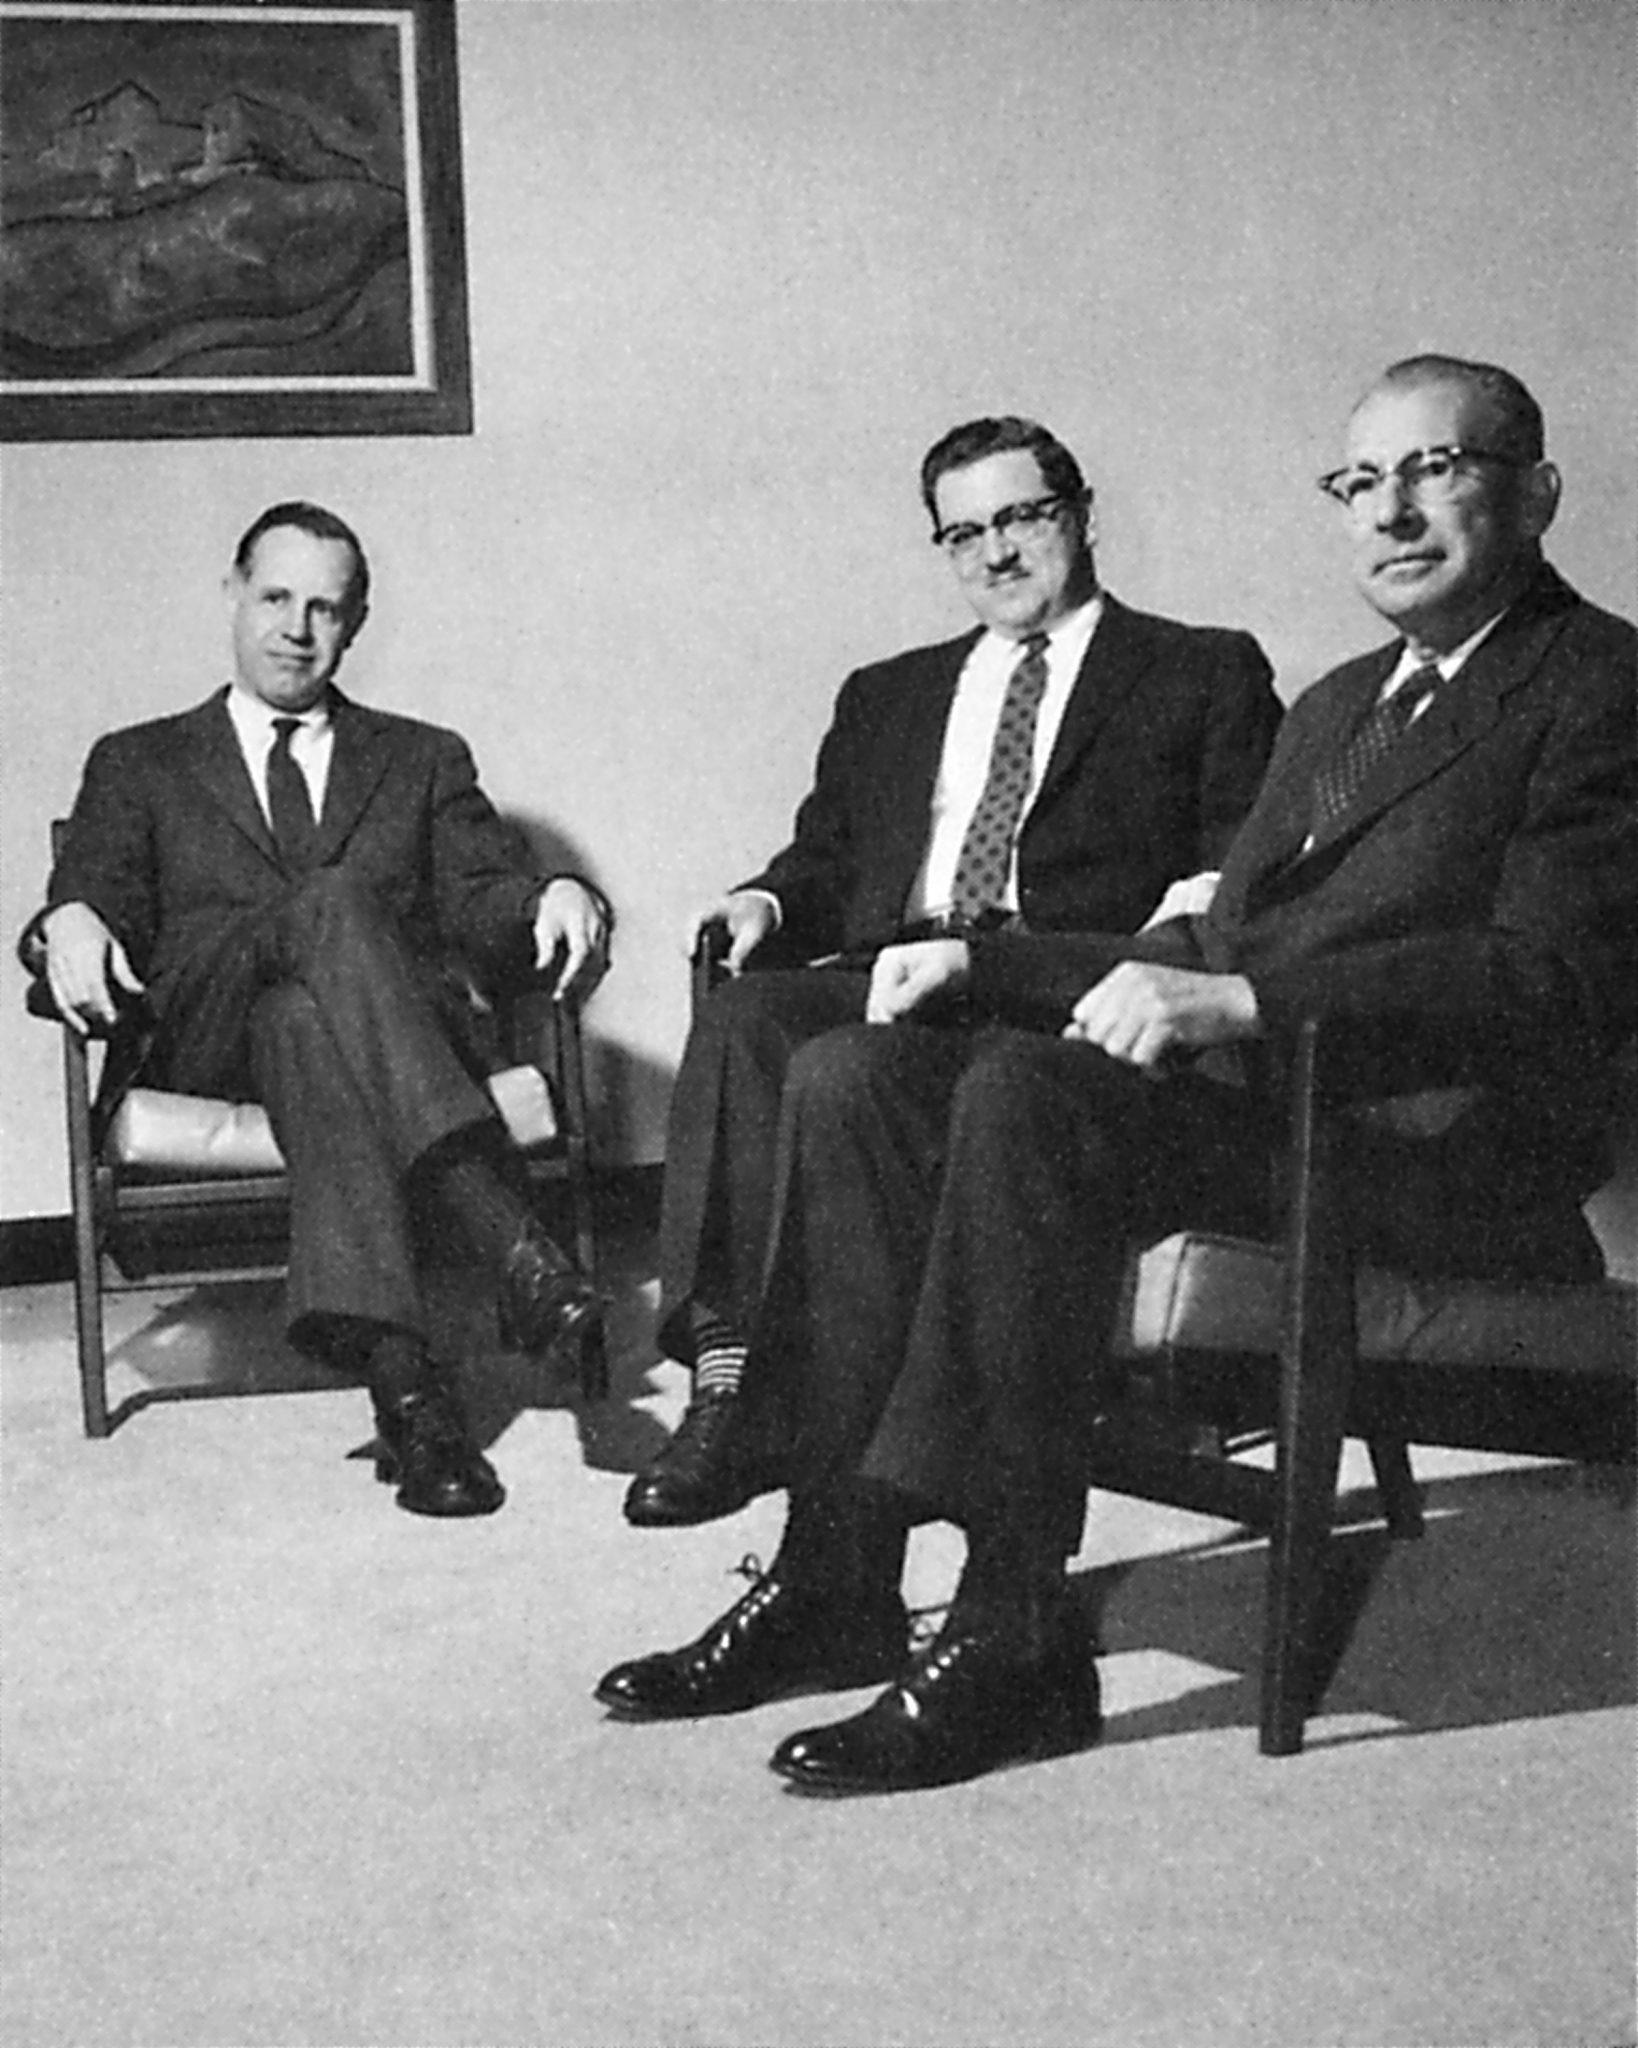 <p>Photograph of Bob Murray, John Rexine, and James C. Austin.</p><p><i>Salmagundi,</i> 1961.</p><p>Colgate University Libraries.</p>